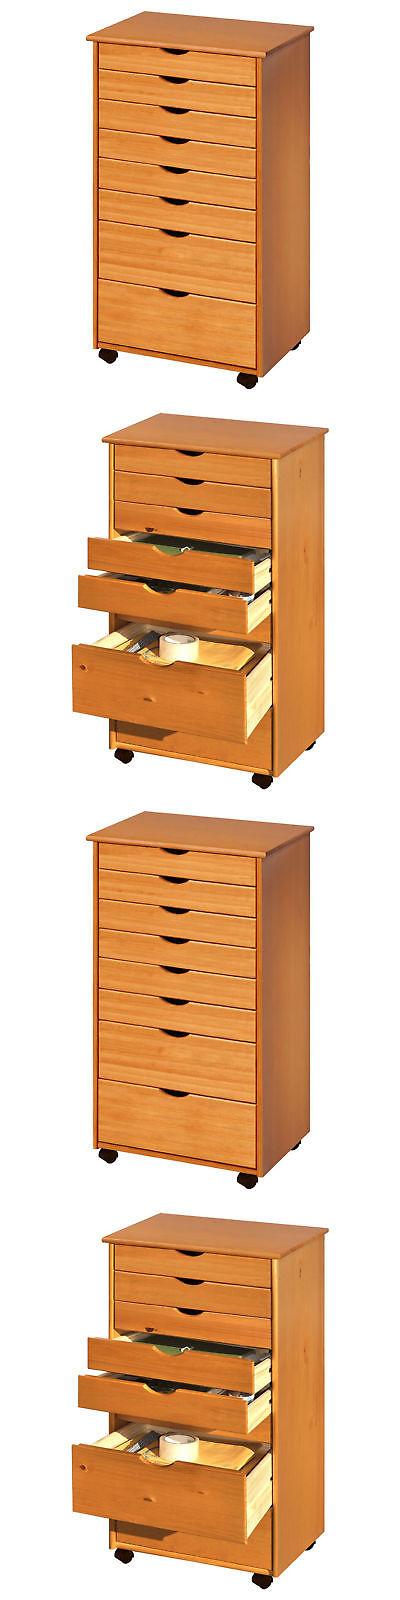 Craft Carts 146400: Craft Storage Cart Scrapbook Rolling Sewing Organizer  Cabinet Wood 8 Drawer Home